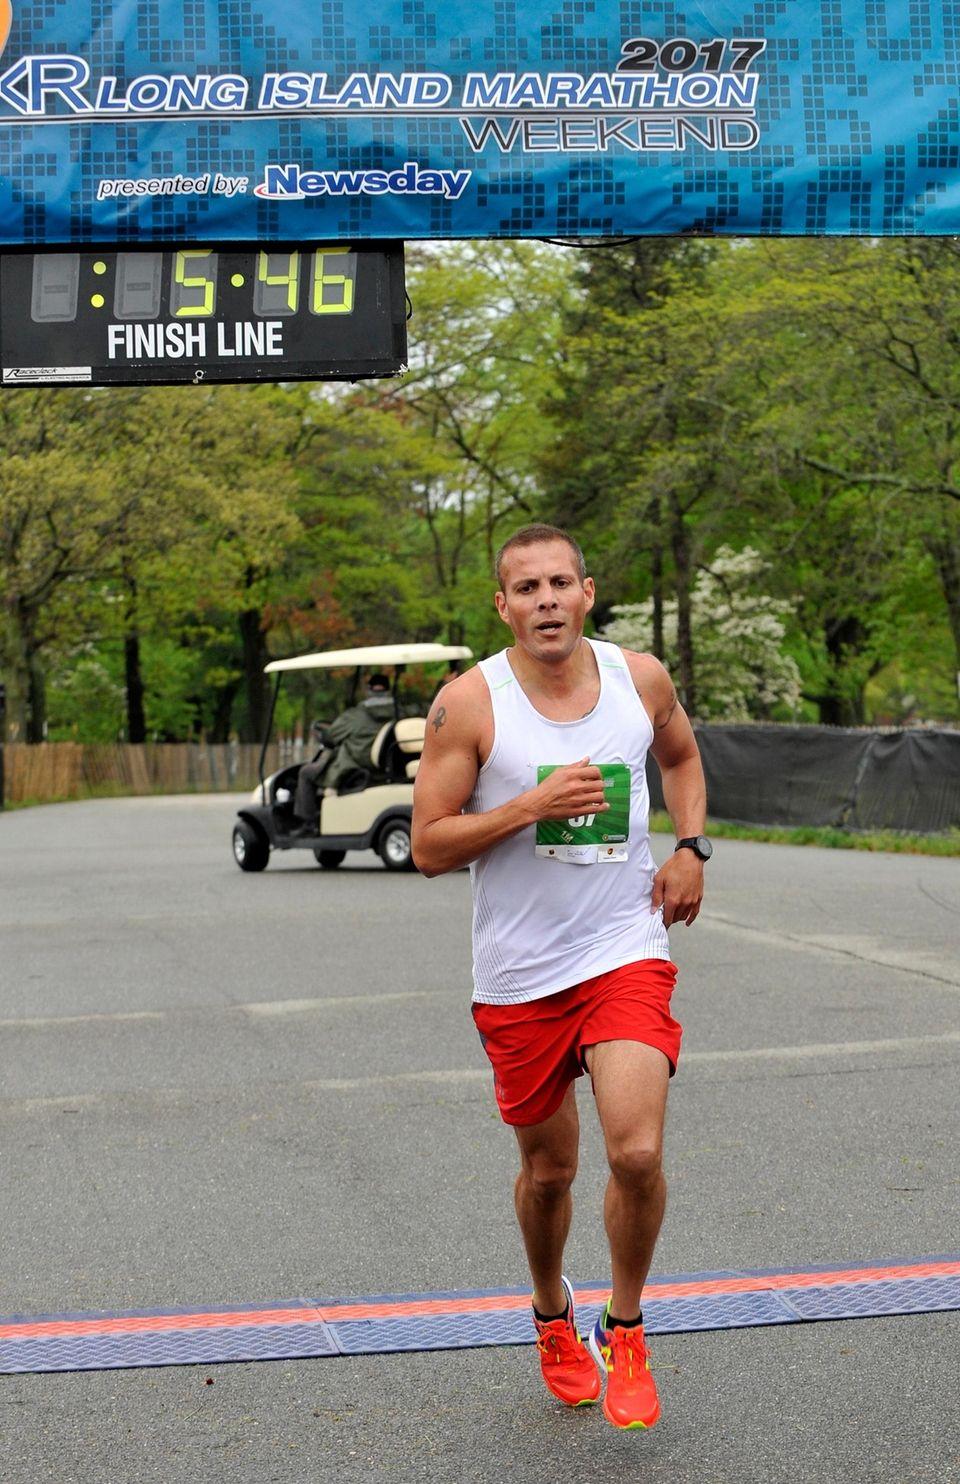 Jason Ramirez, of Wantagh, crosses the finish line